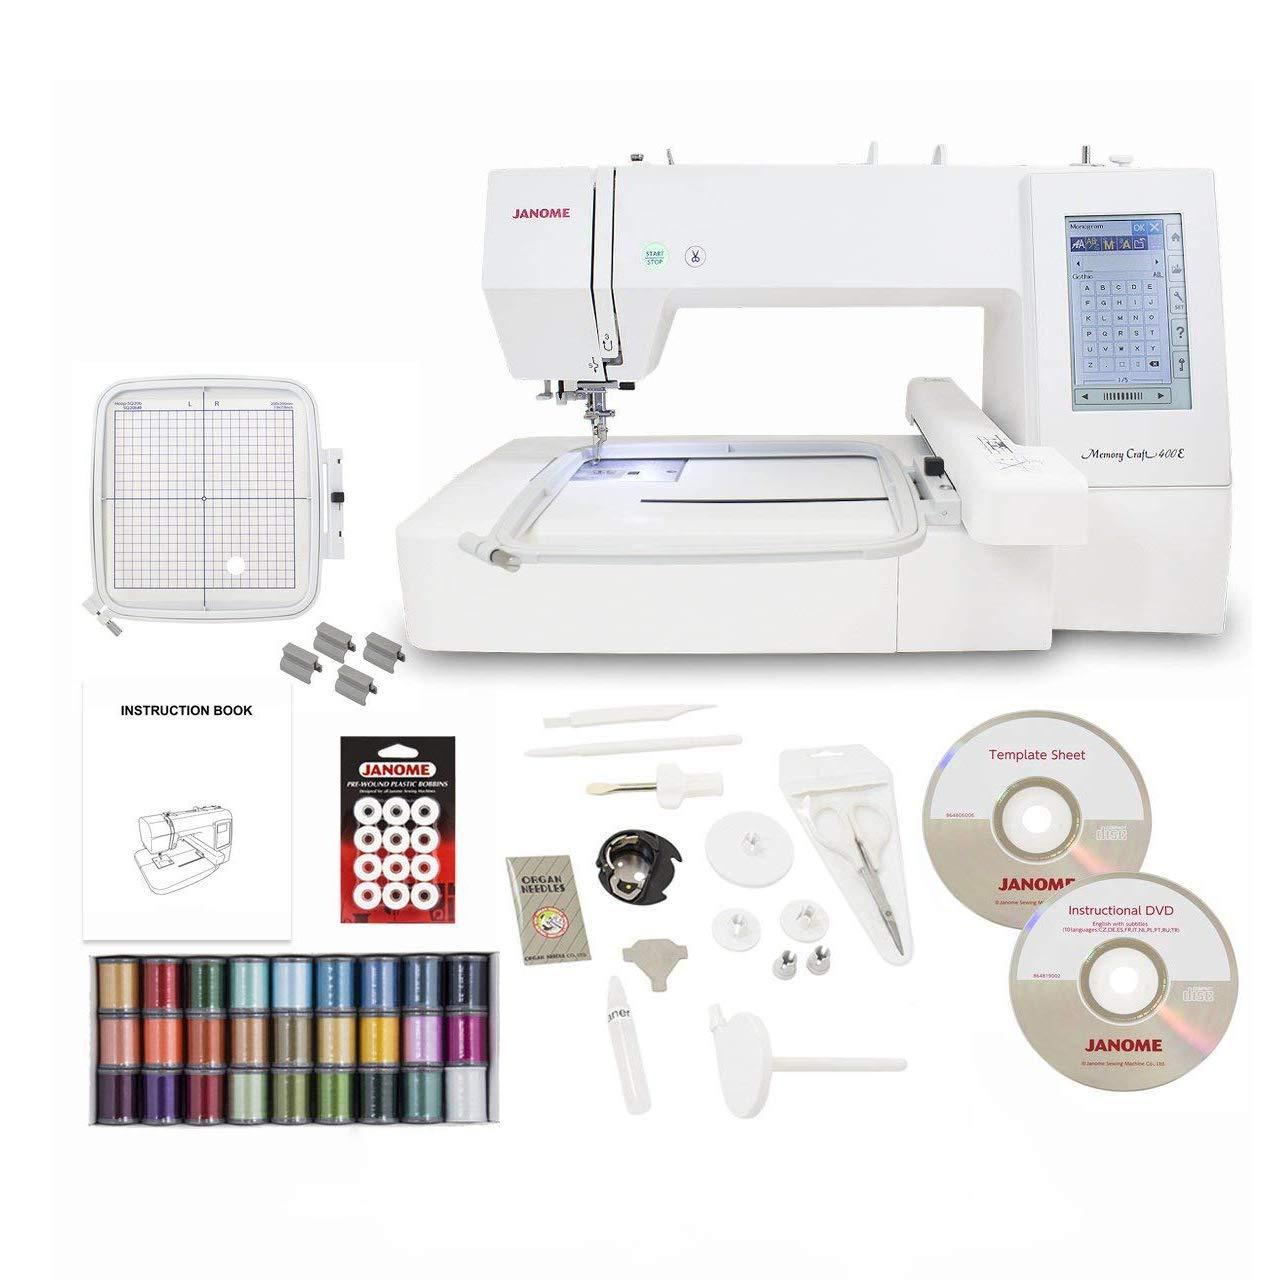 Janome Memory Craft 400E Embroidery Machine with Exclusive Bonus Bundle MC400E